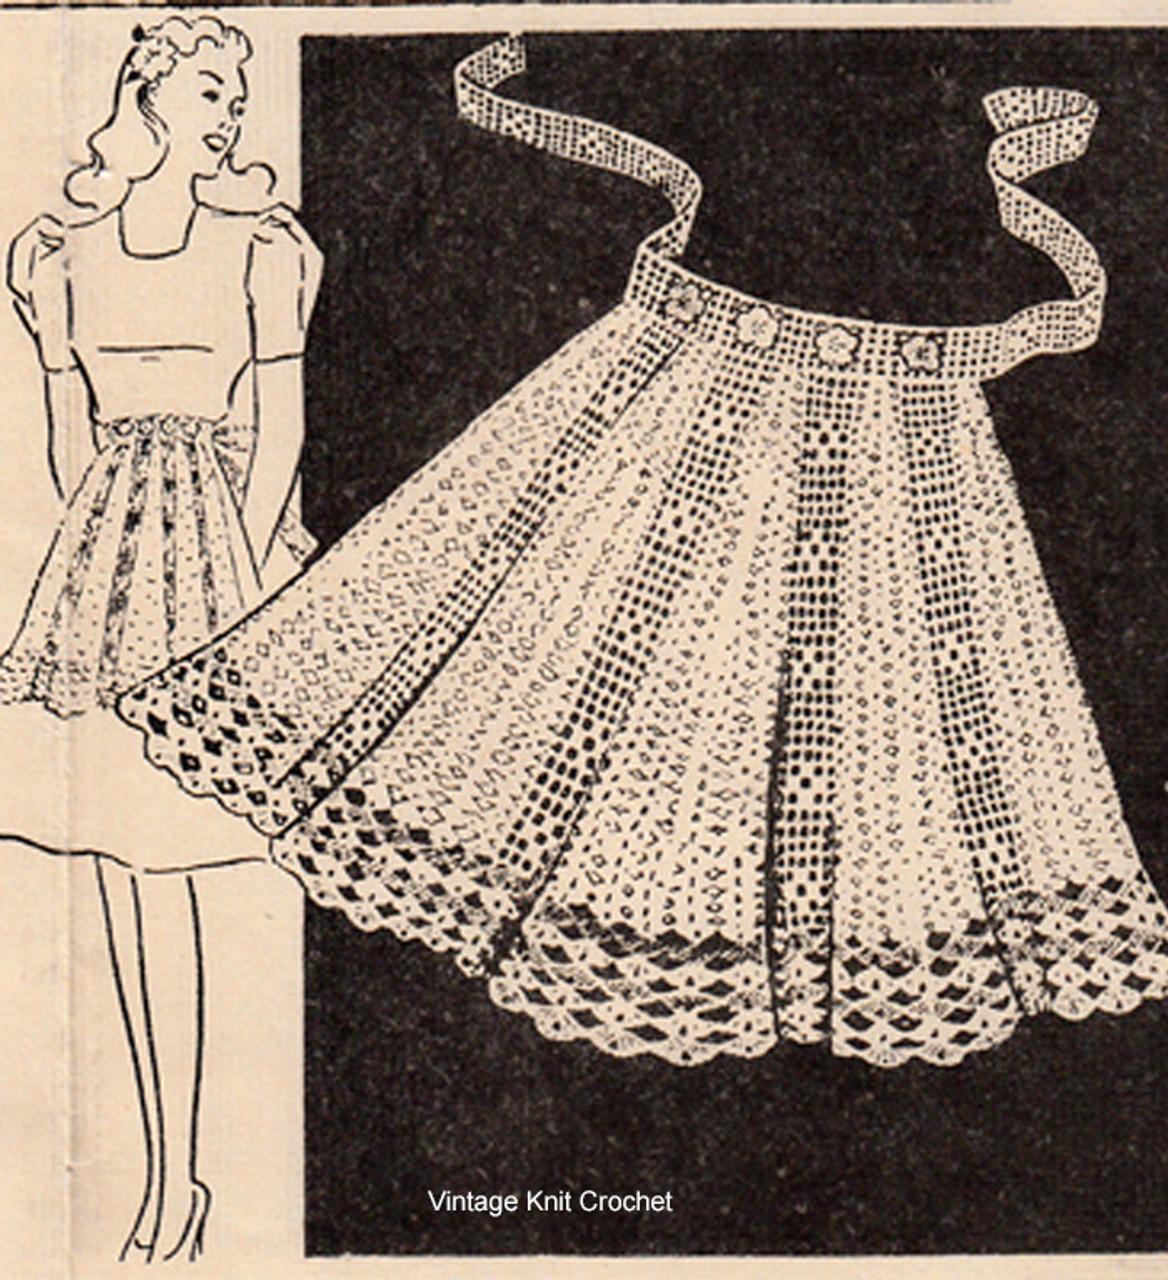 Vintage Apron Filet Crochet pattern for workbasket